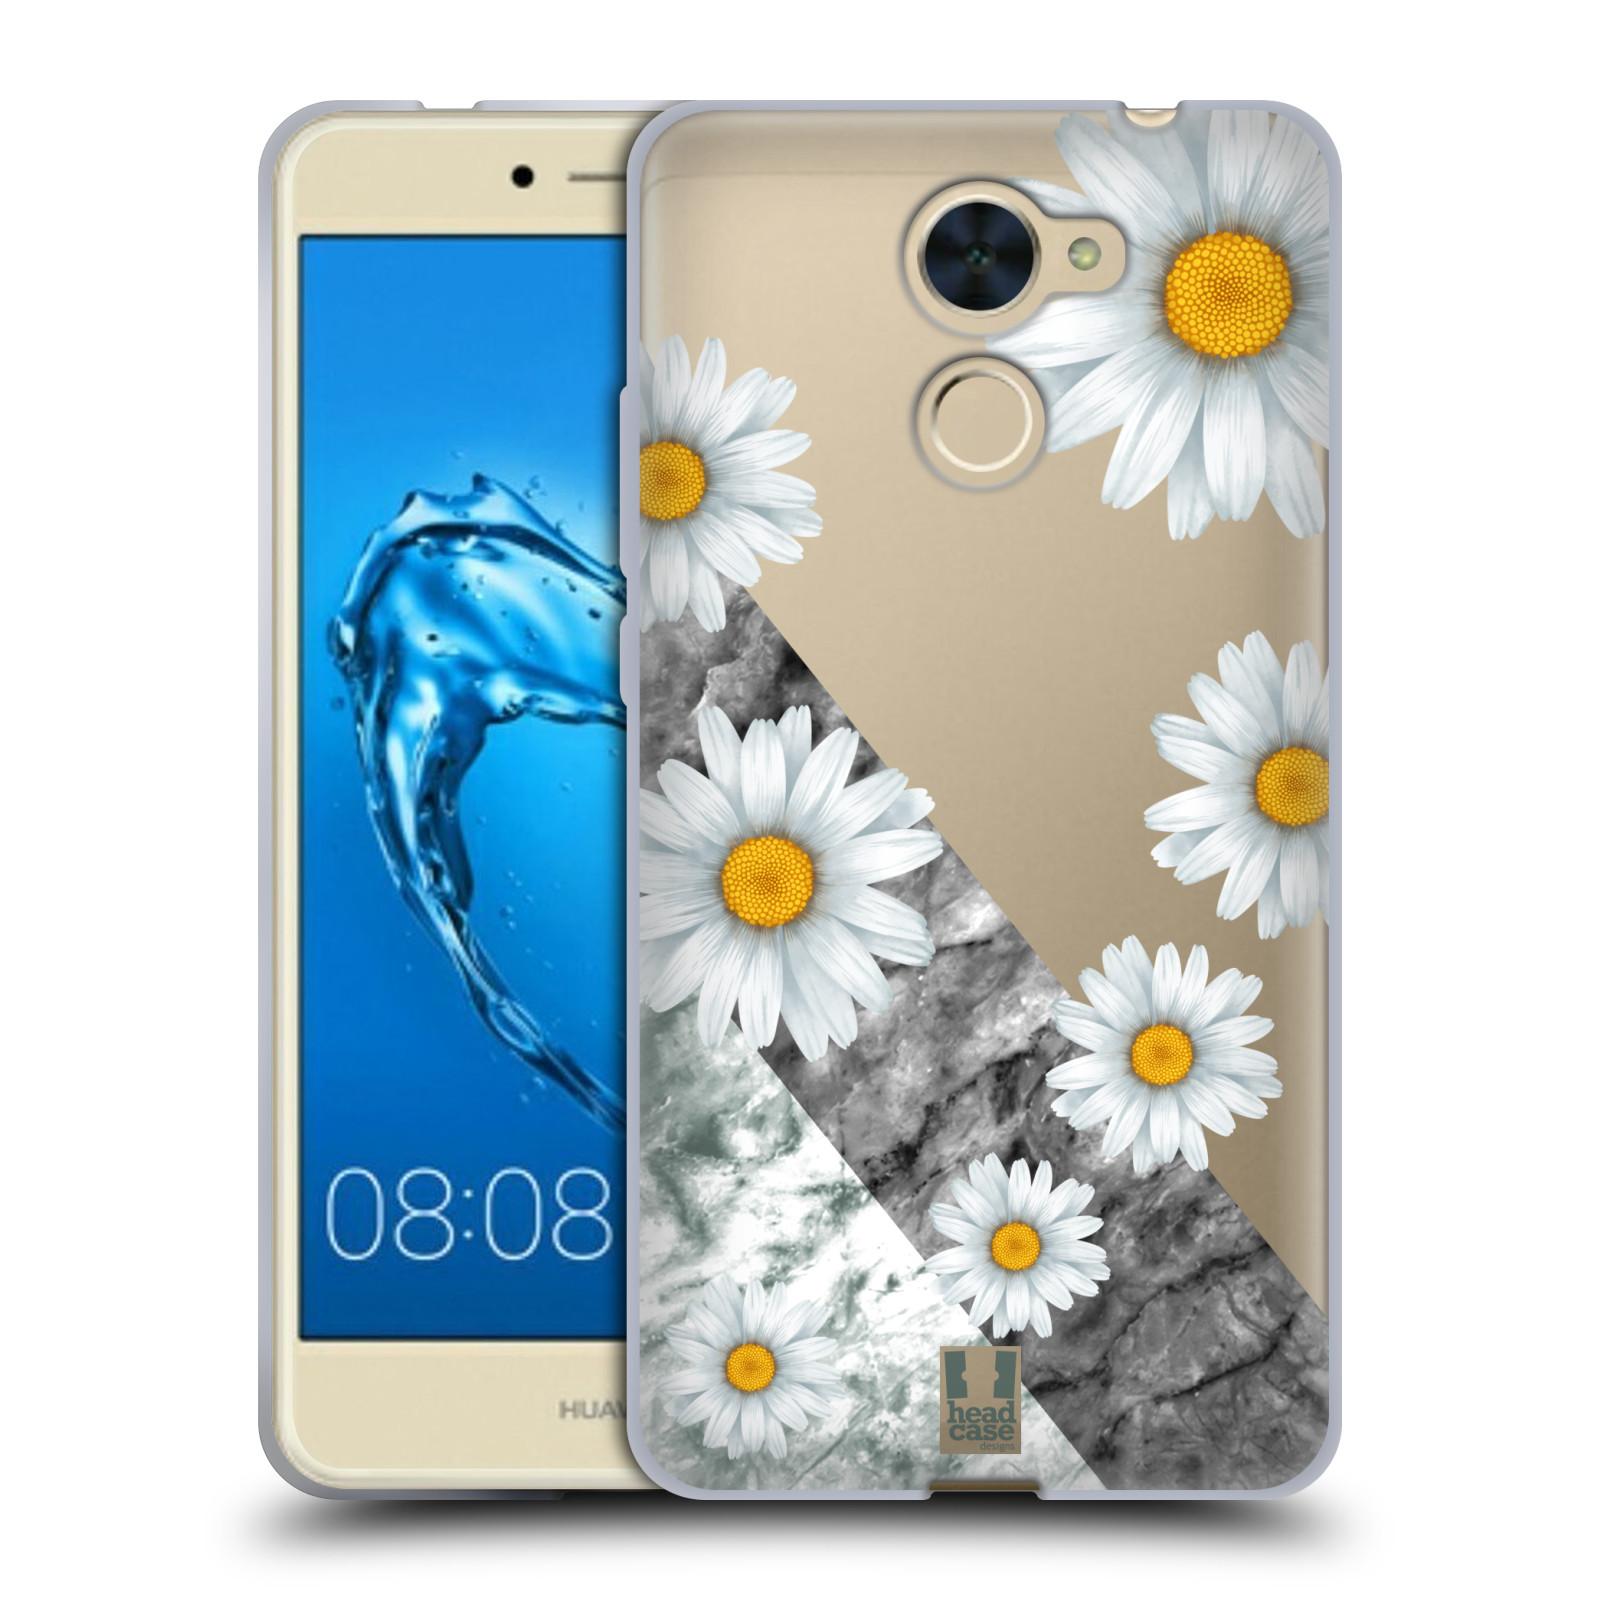 Silikonové pouzdro na mobil Huawei Y7 - Head Case - Kopretiny a mramor